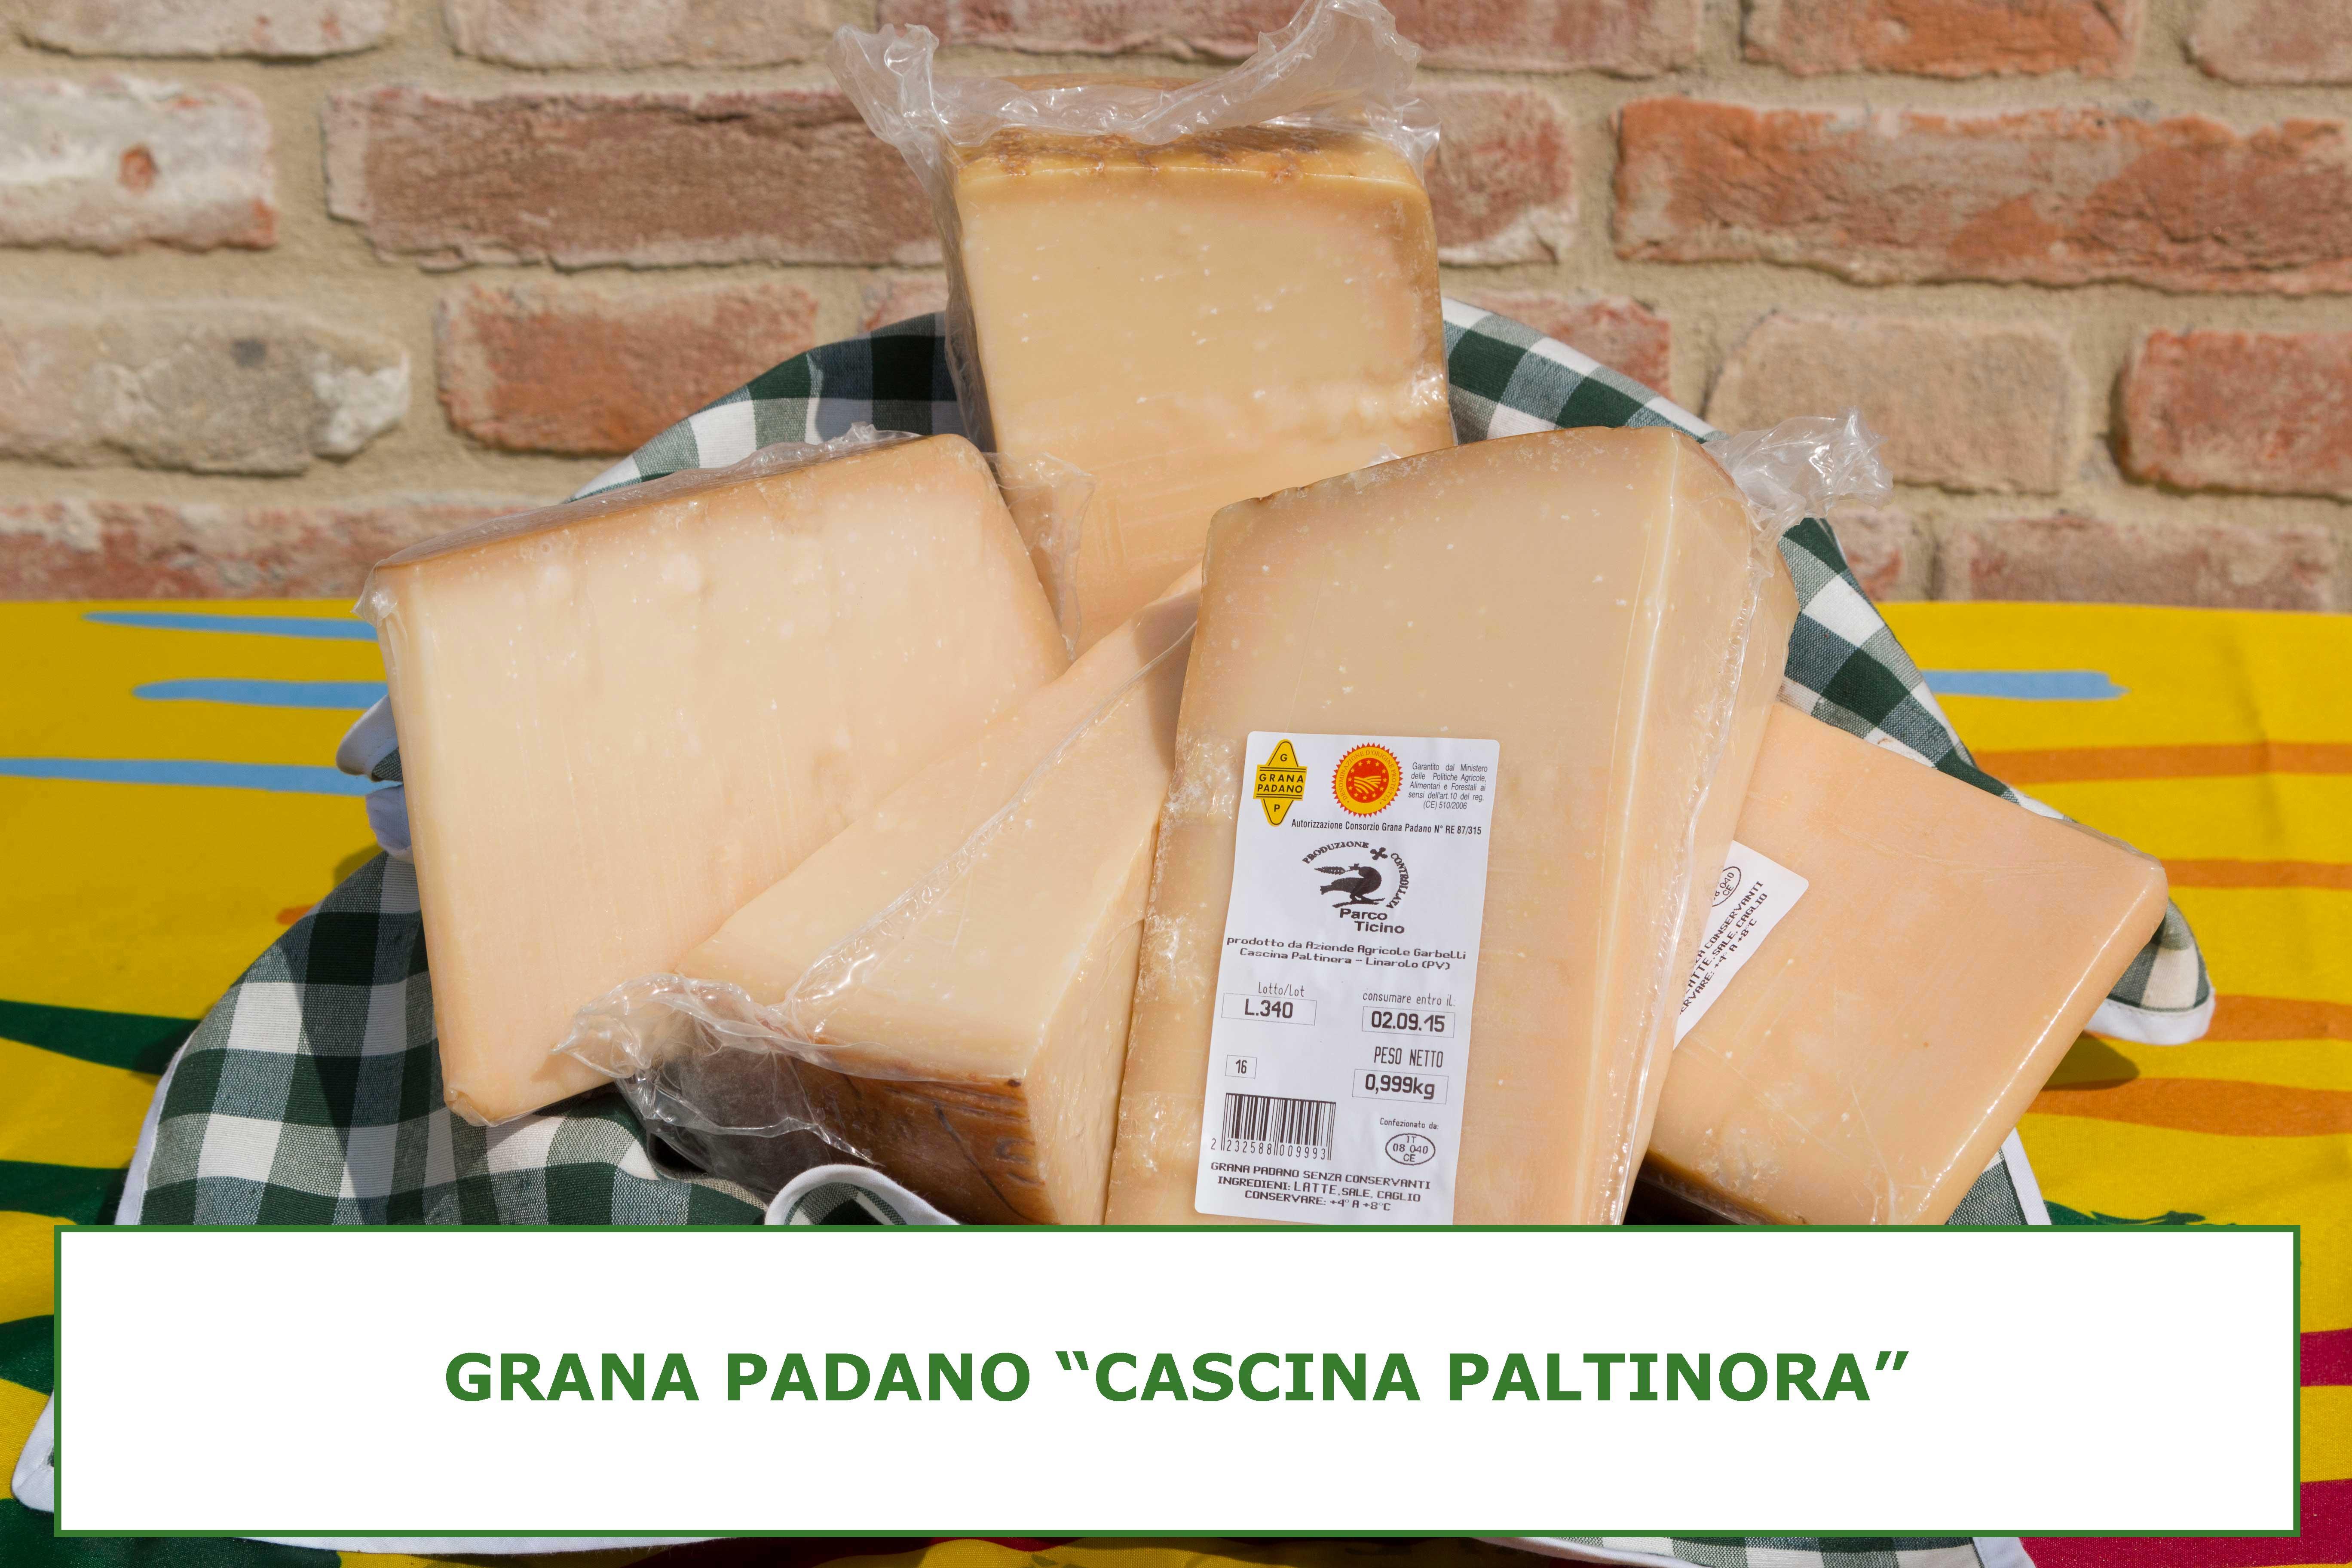 GRANA-PADANO-CASCINA-PALTINORA